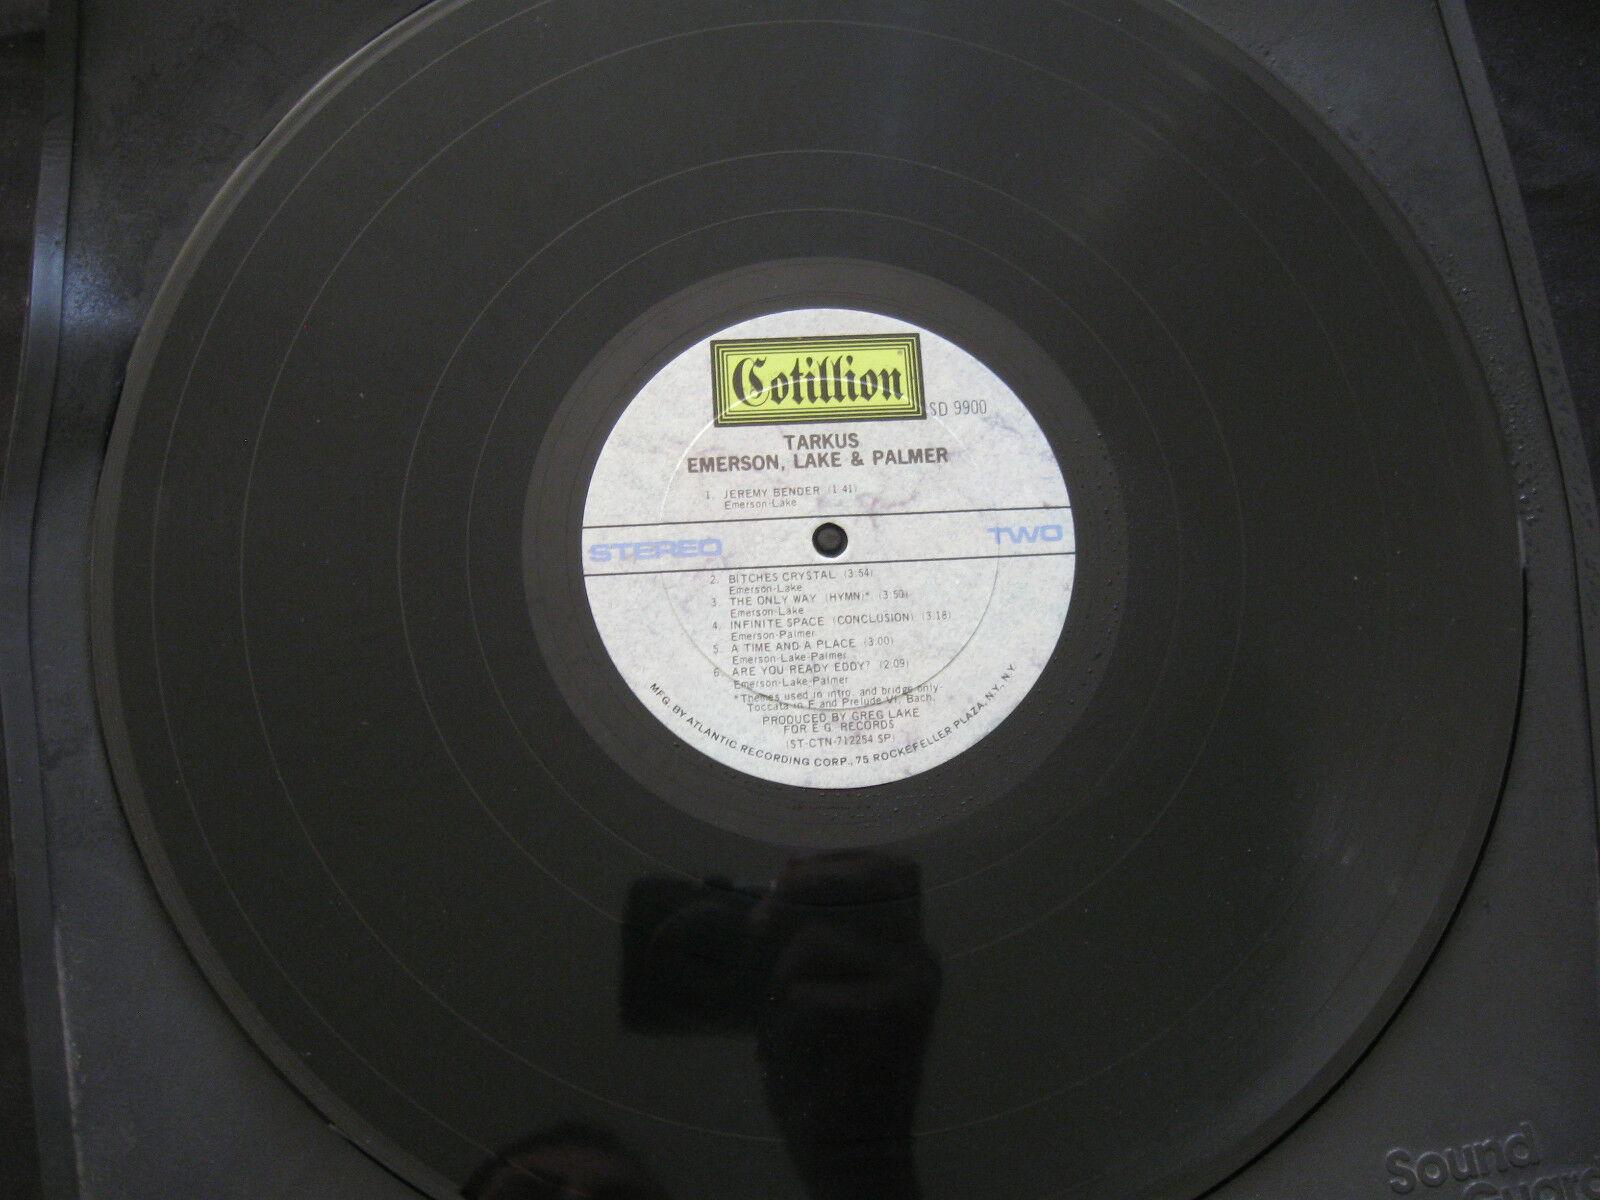 Emerson Lake & Palmer ELP Tarkus Cotillion SD 9900 Stereo Vinyl LP Record Album image 7